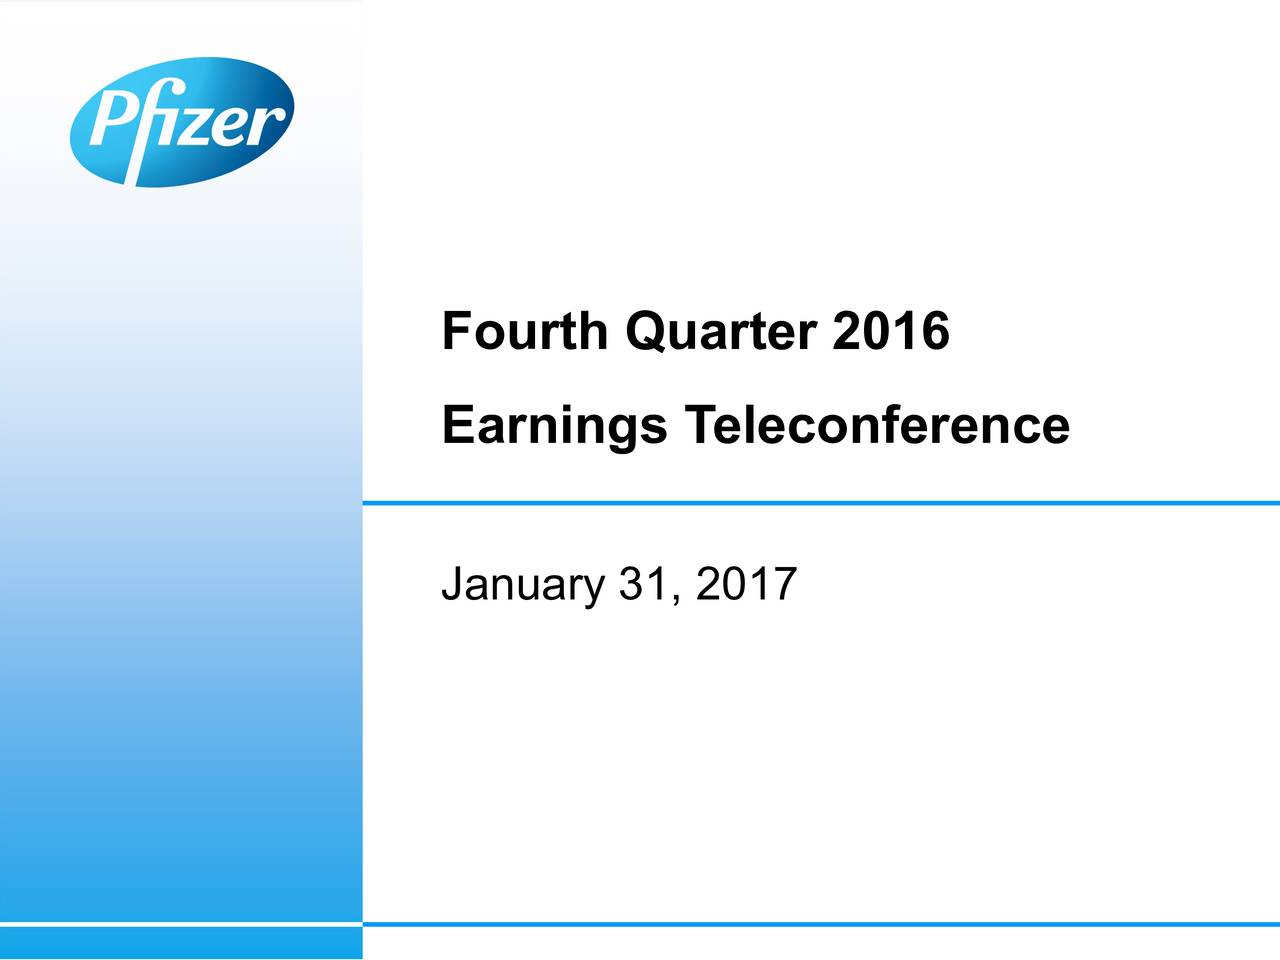 Earnings Teleconference January 31, 2017